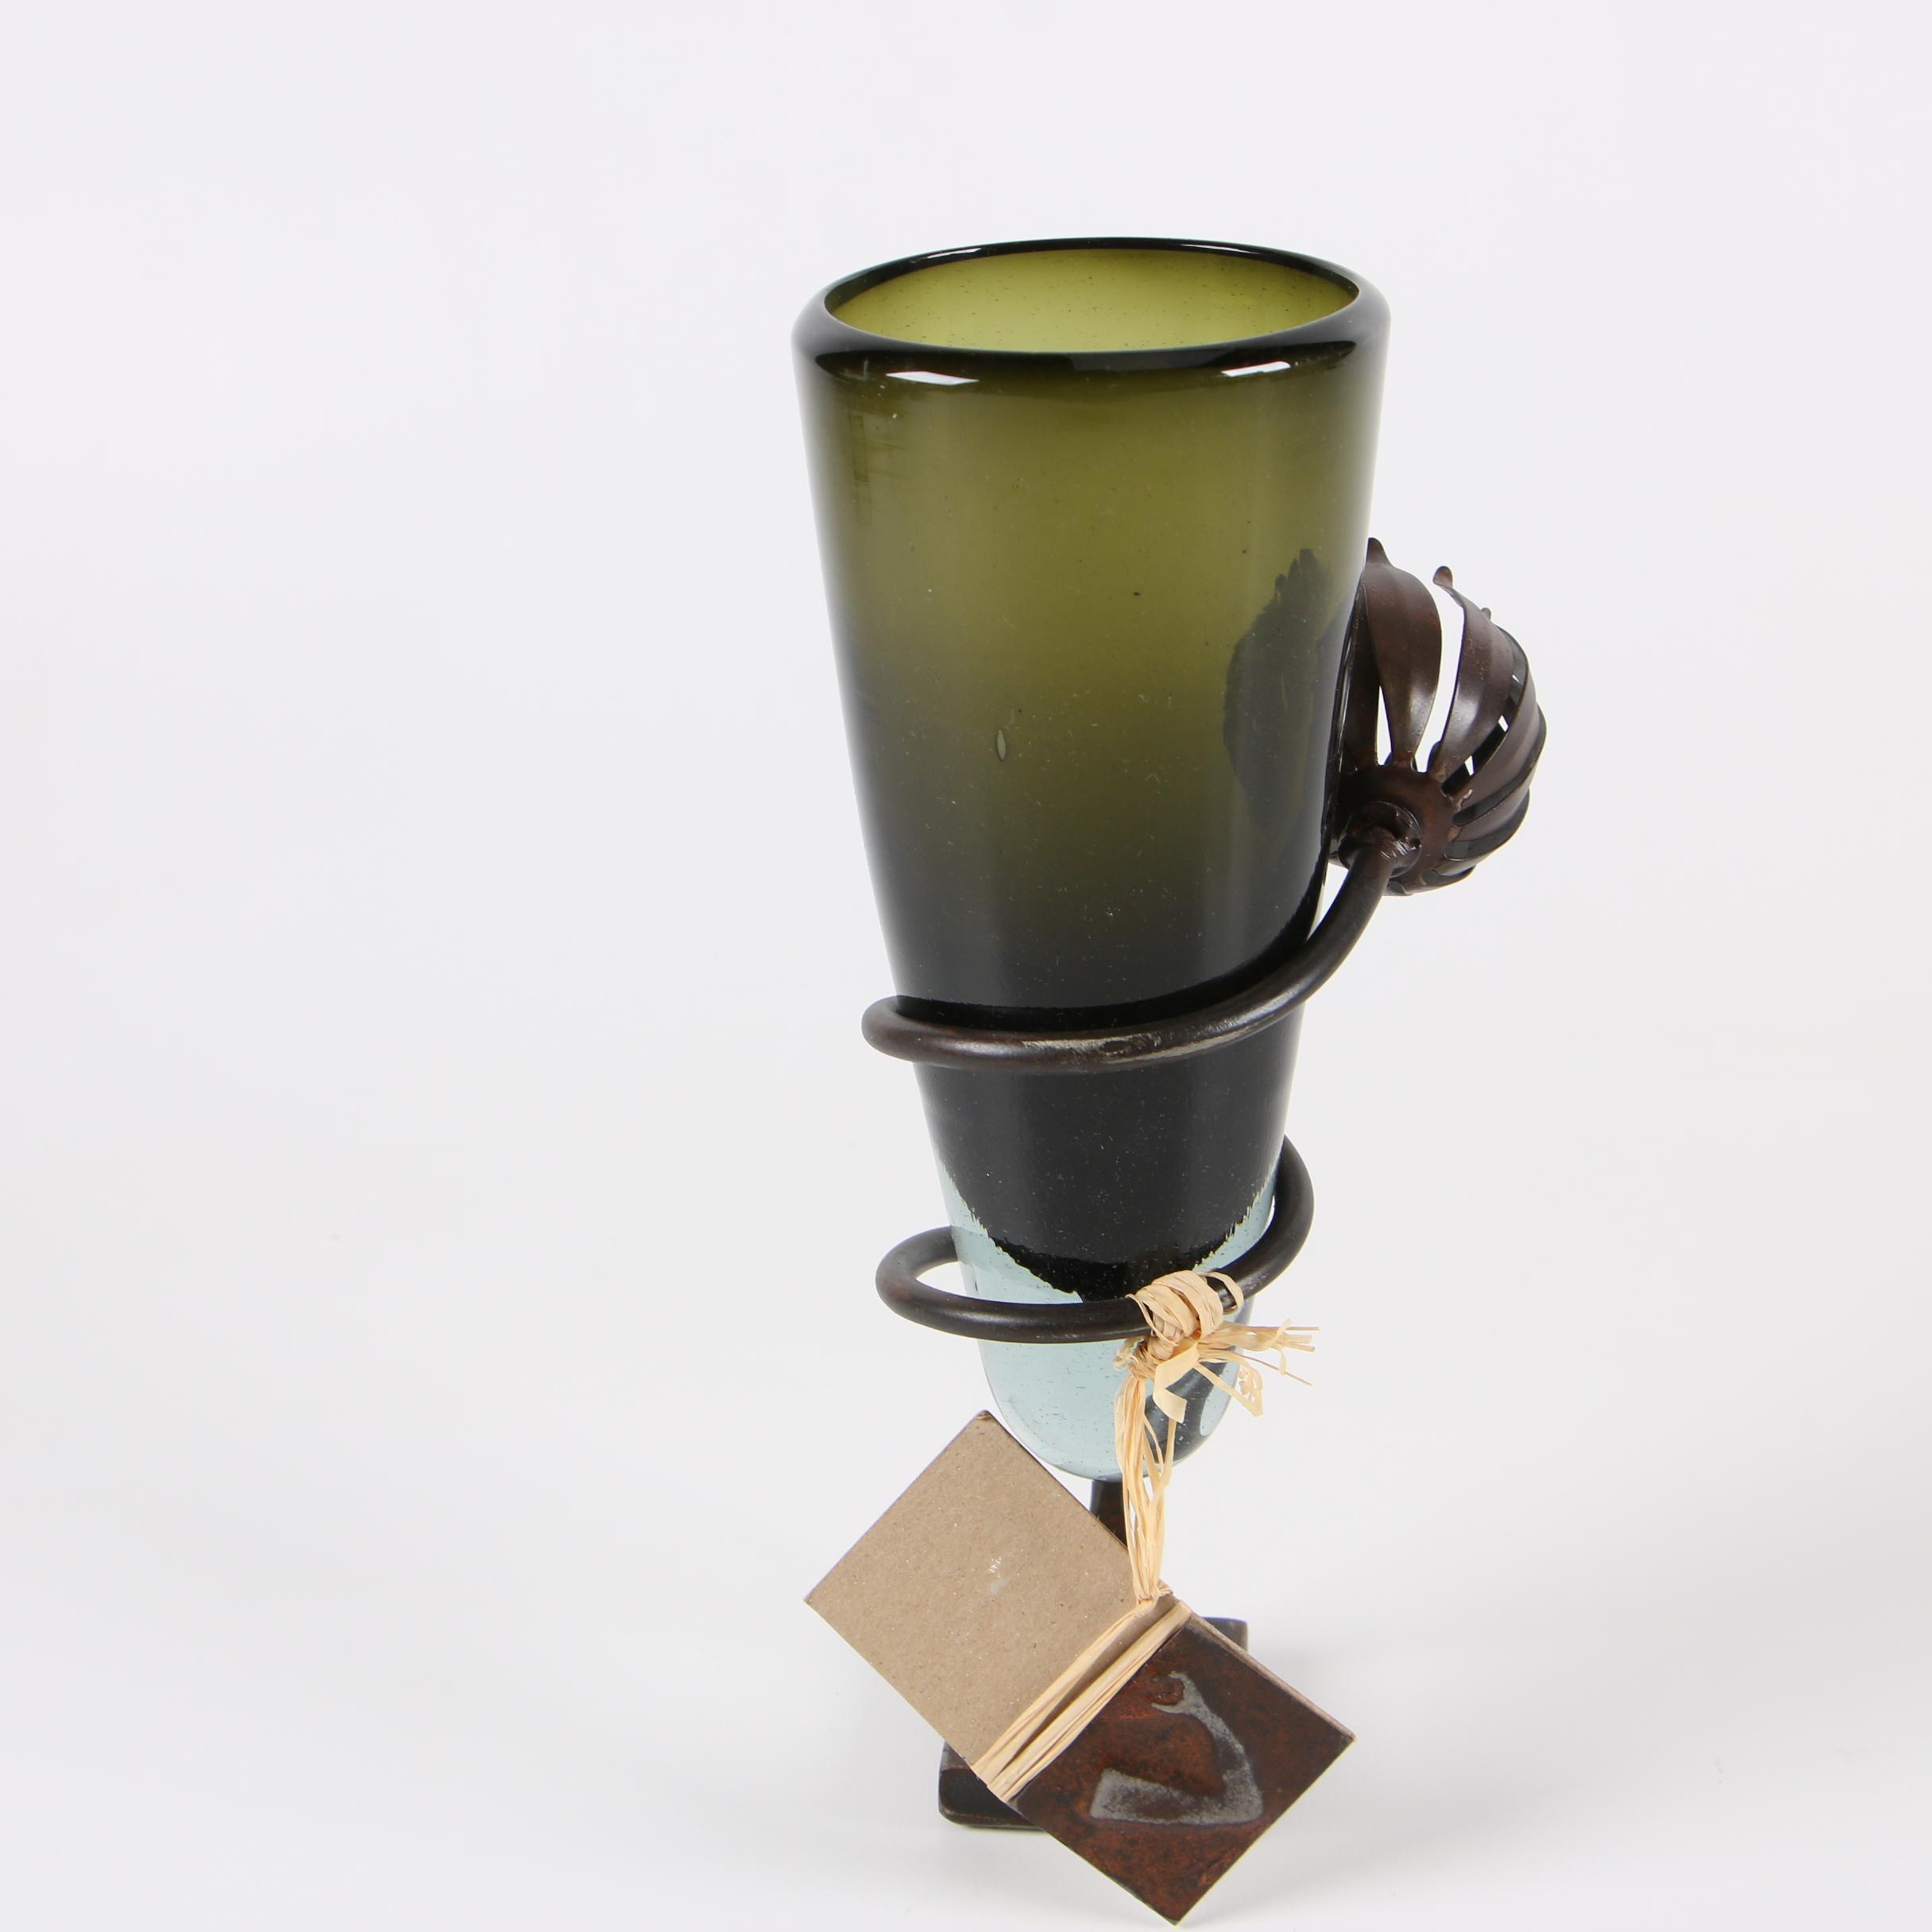 Jan Barboglio Hand Worked Iron and Glass Vase